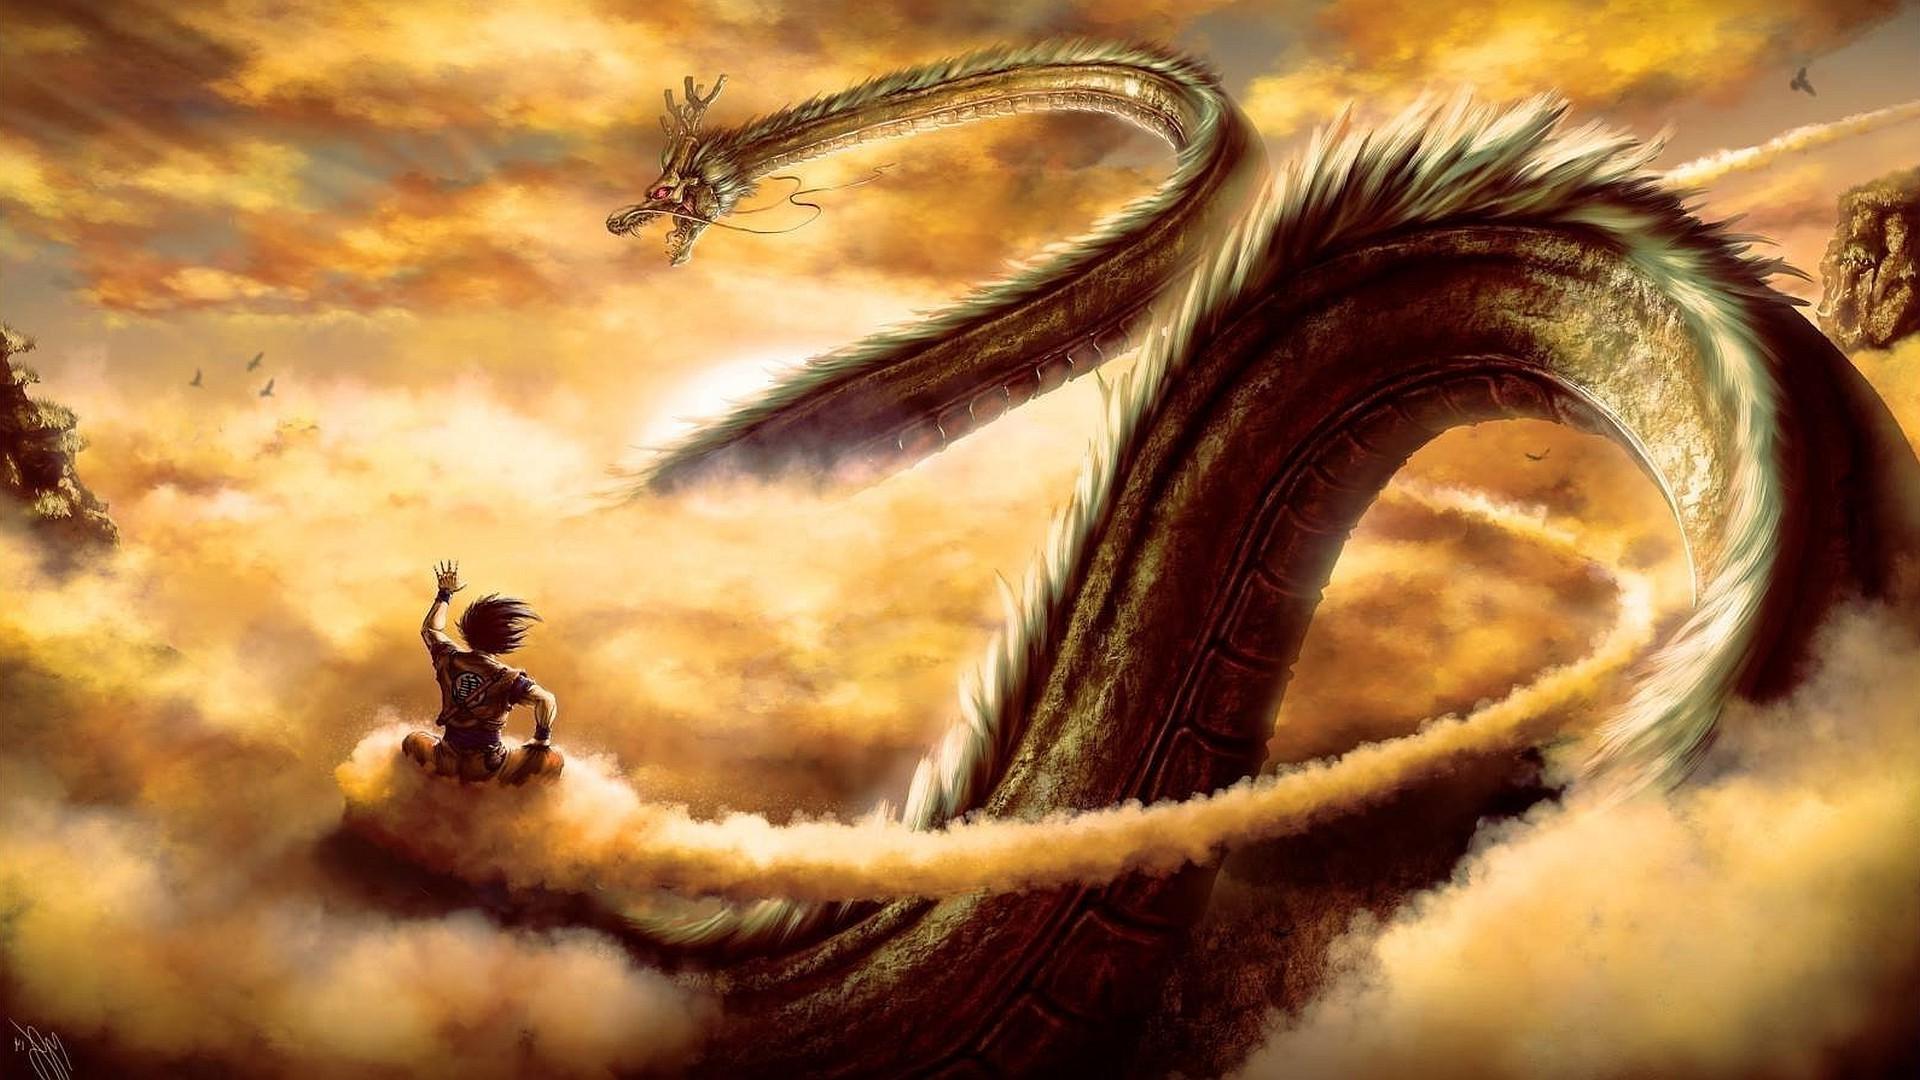 Res: 1920x1080, Dragon Ball Z, Dragon Ball, Artwork, Dragon, Fantasy Art, Son Goku, Dragon  Ball Super, Shen Wallpapers HD / Desktop and Mobile Backgrounds